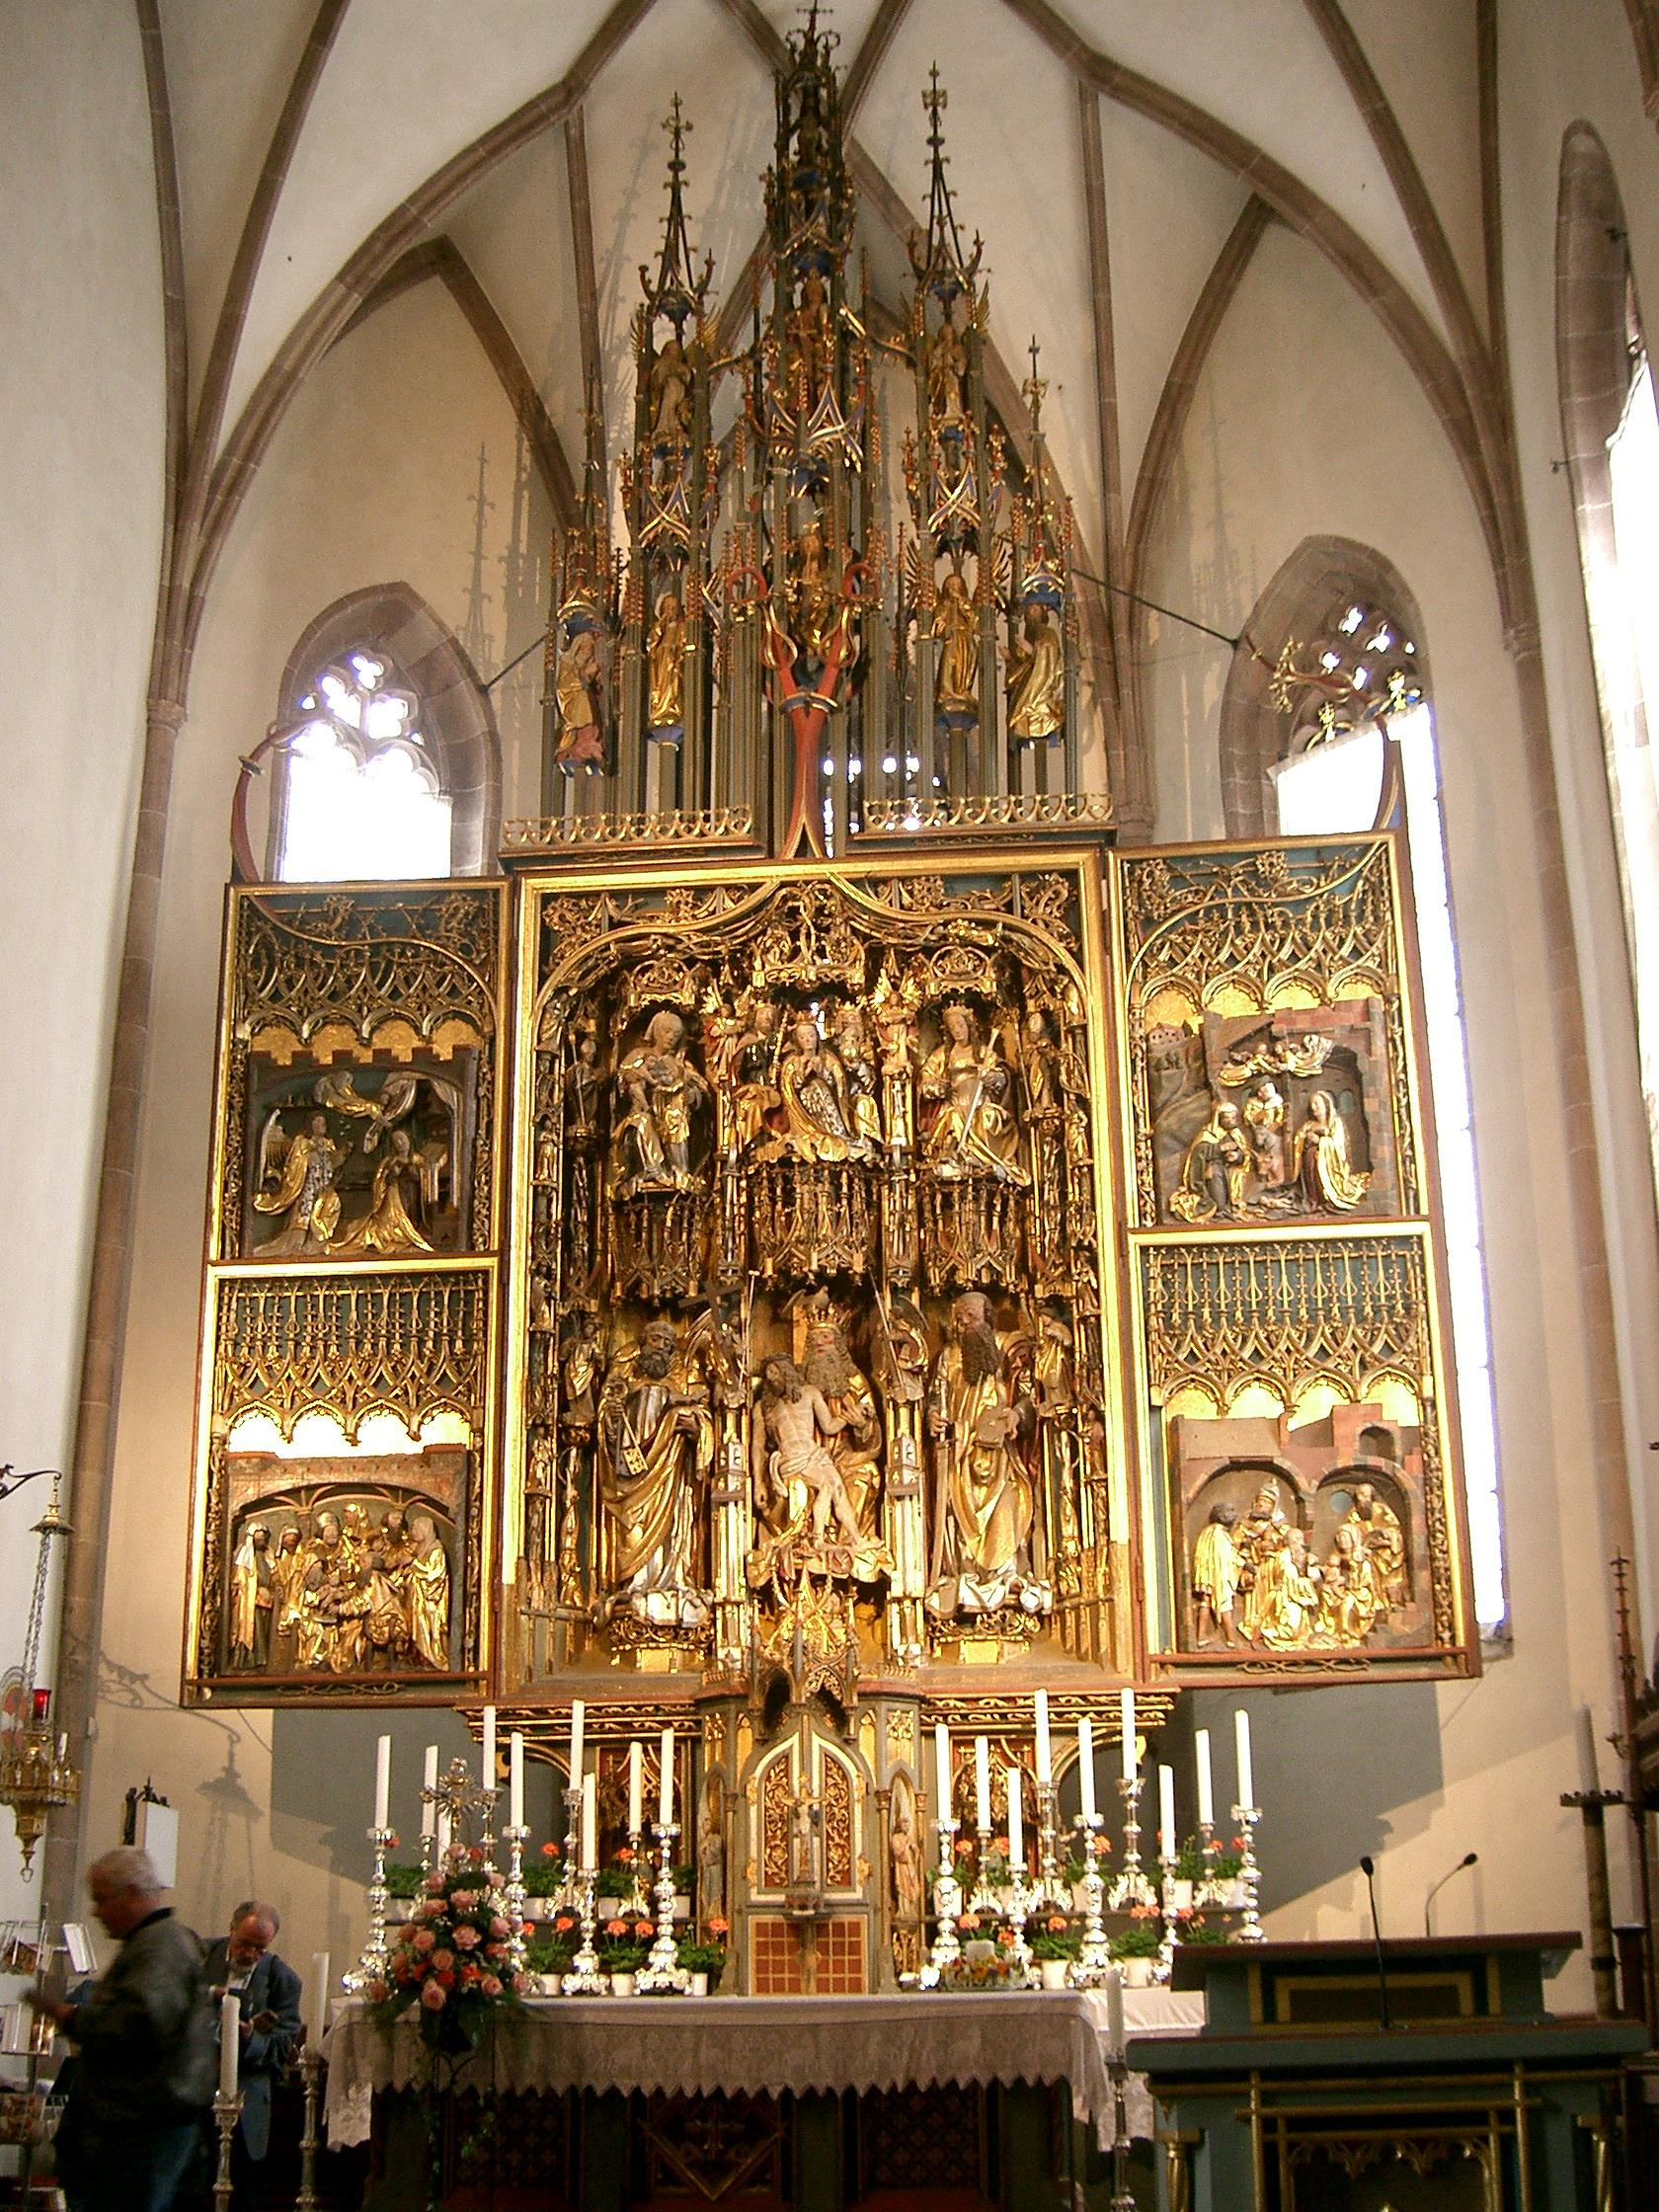 NLana Pfarrkirche Altar1.JPG